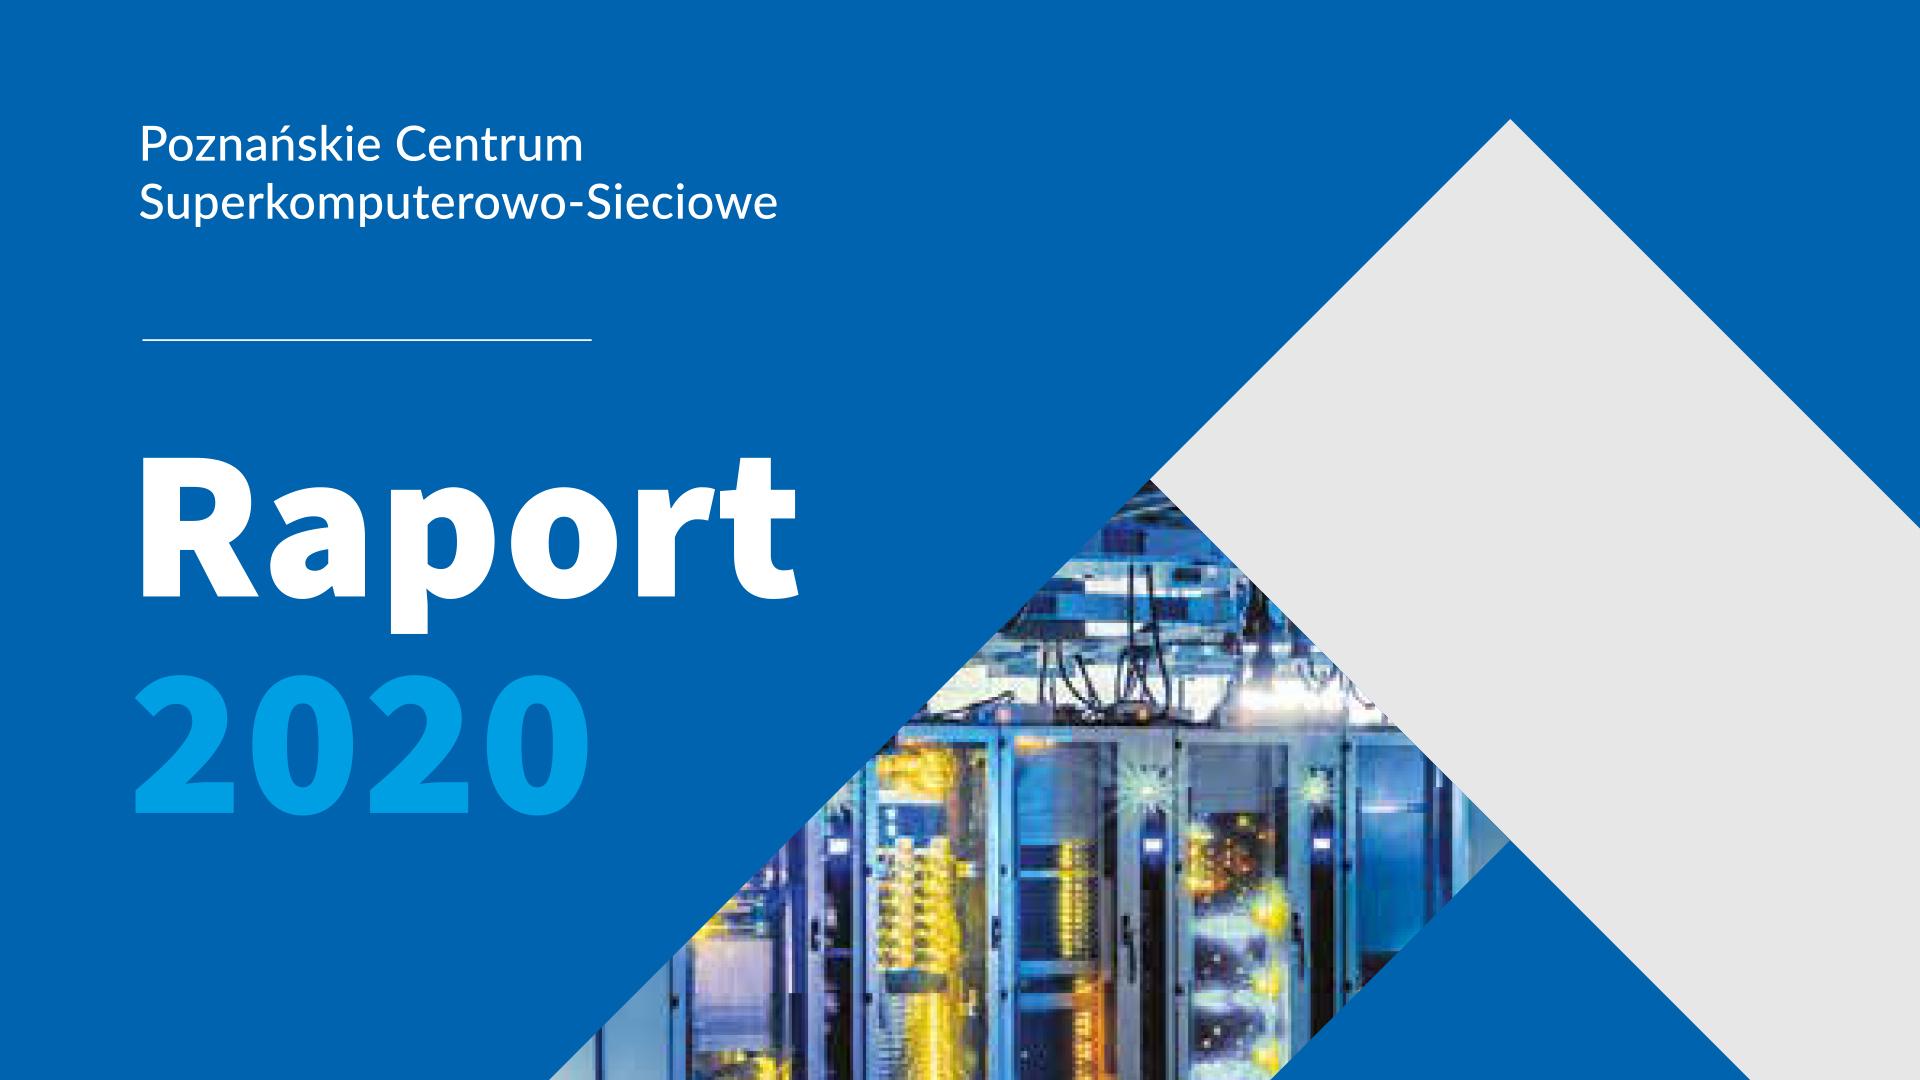 Report on PSNC activities in 2020